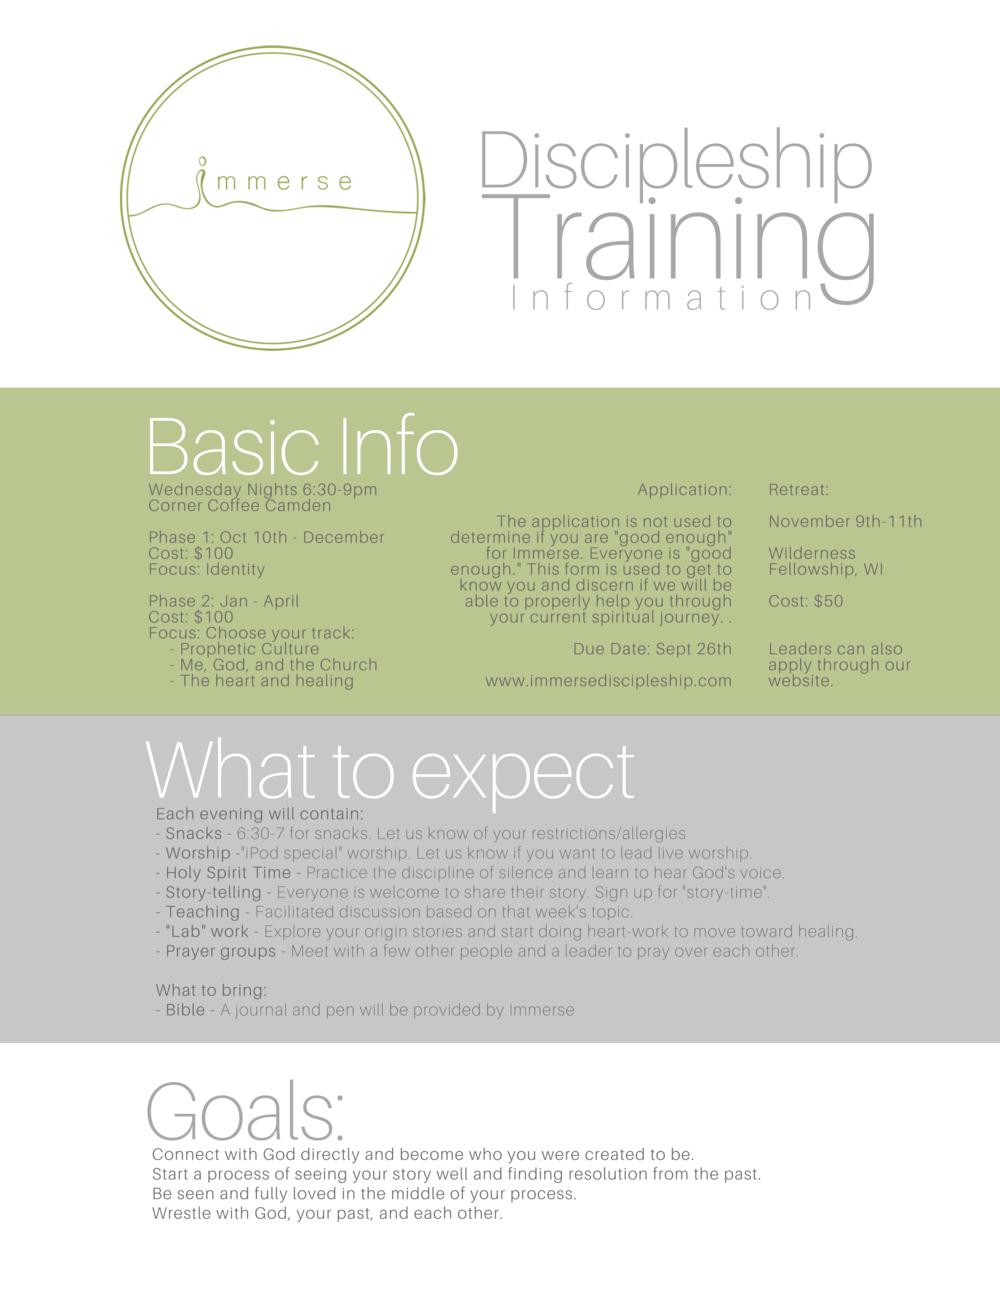 DiscipleshipTraining.png